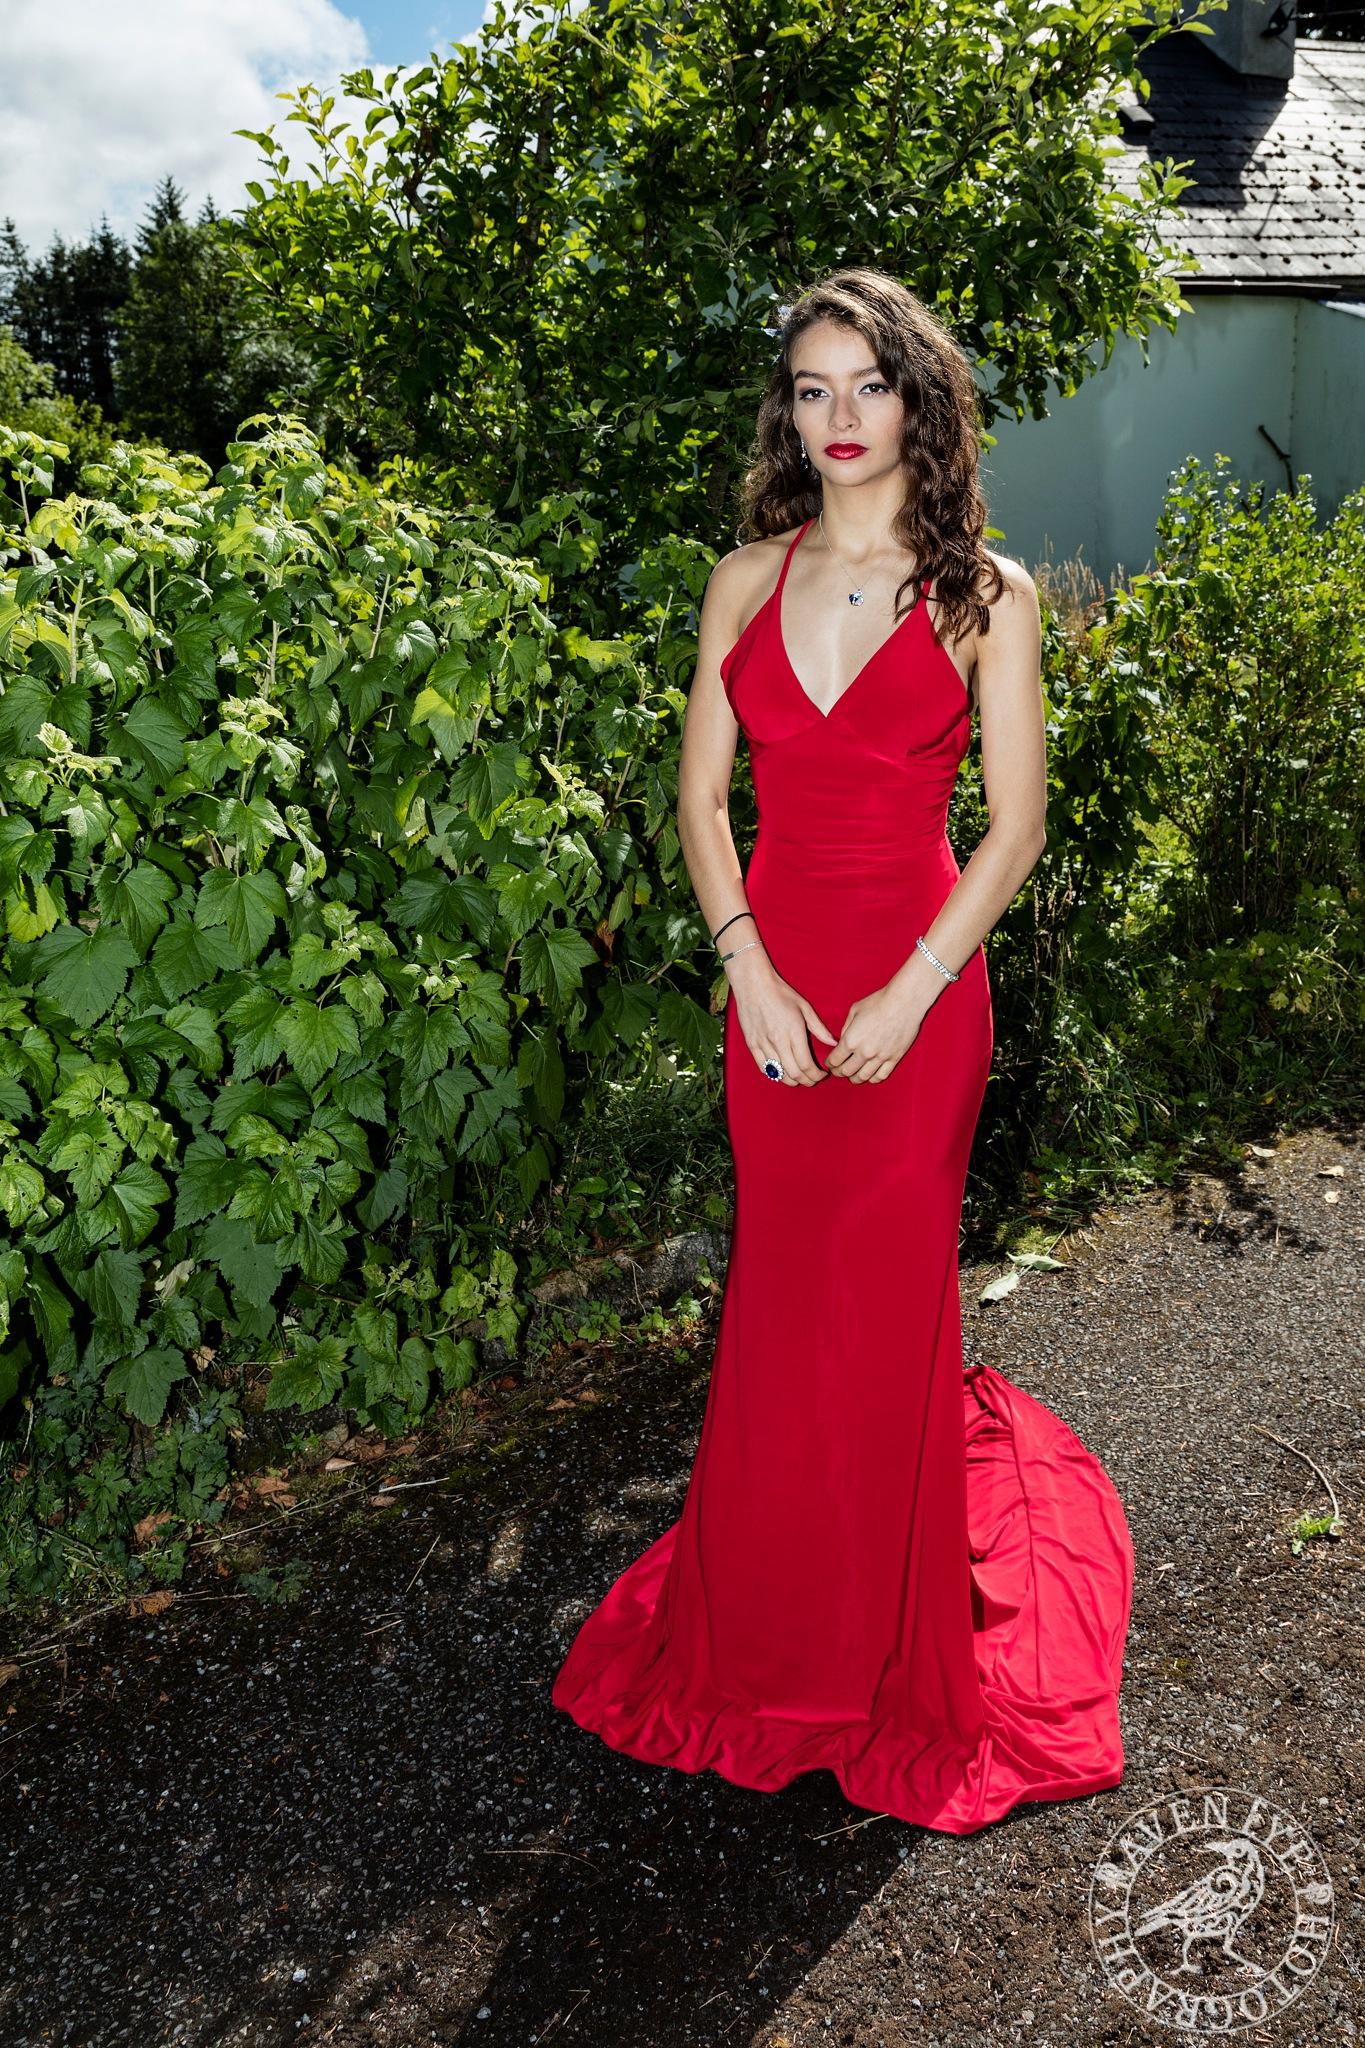 Lady in Red by Declan Byrne